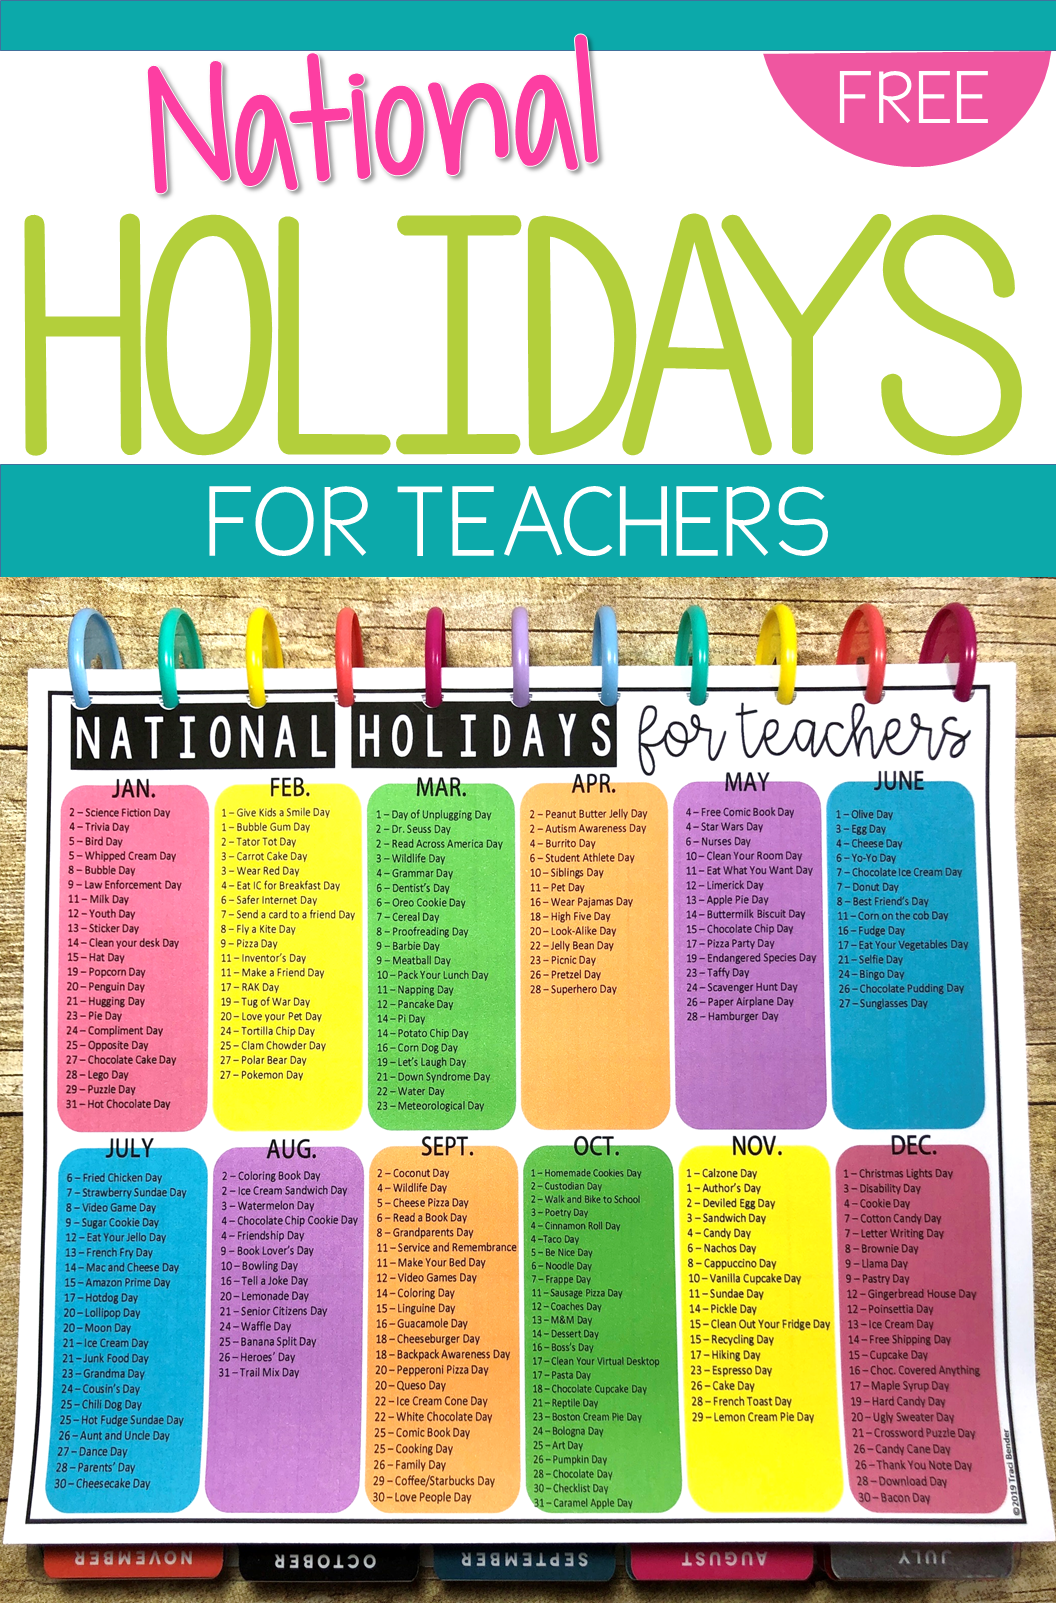 National Holidays For Teachers National Holiday Calendar School Holiday Calendar Holiday Calendar